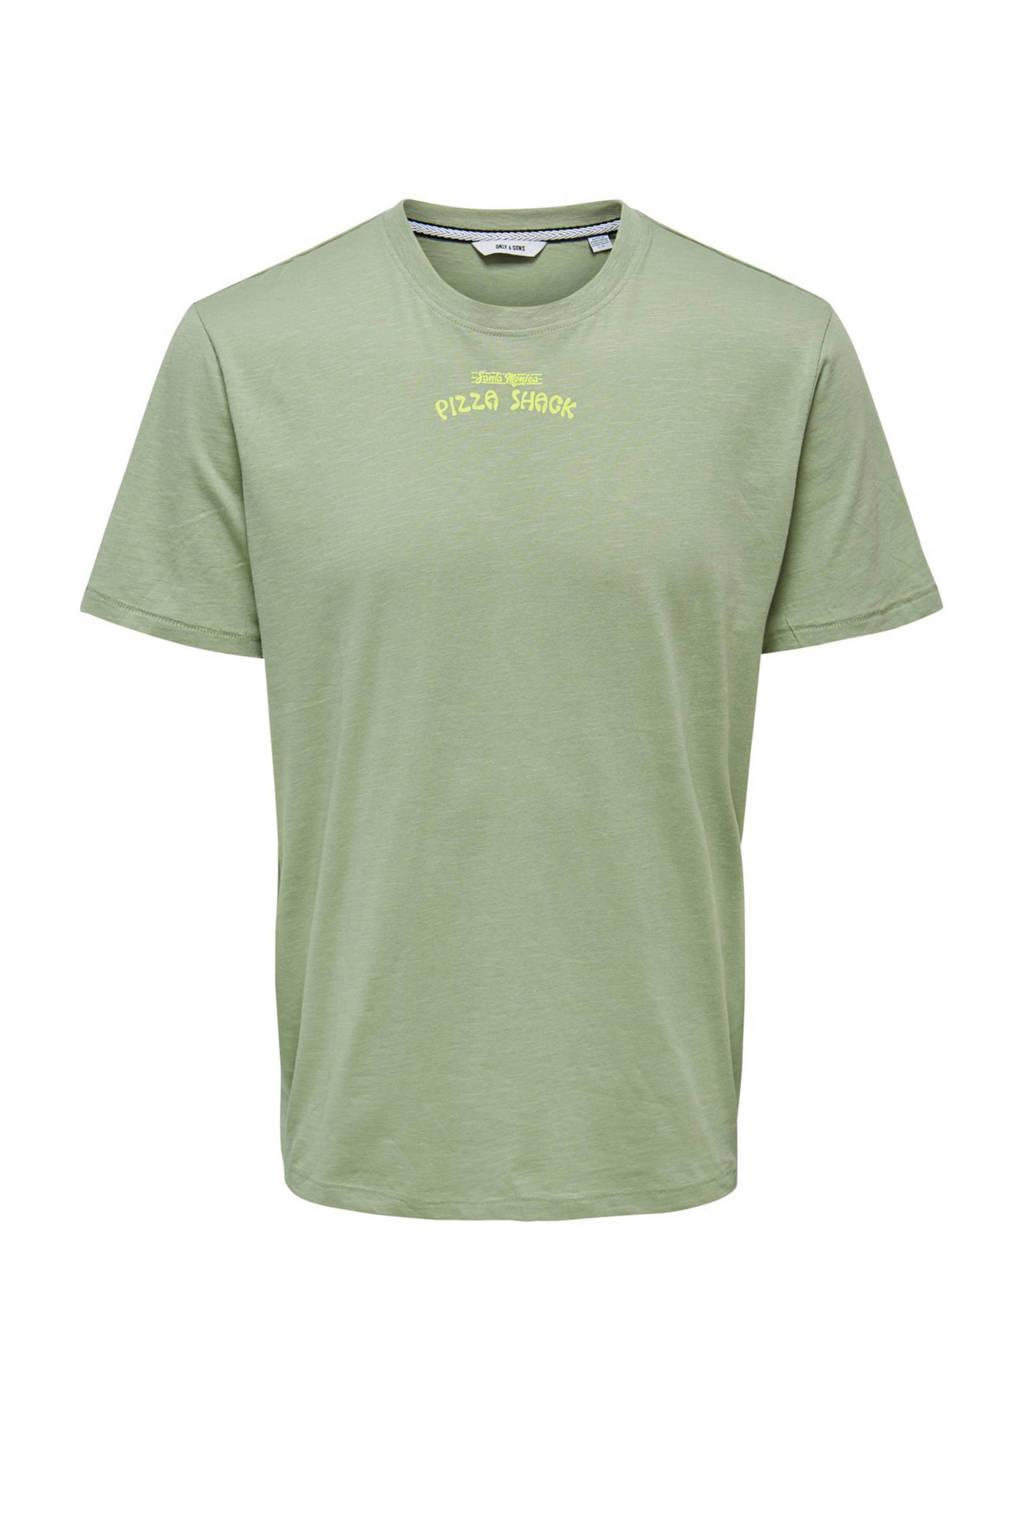 ONLY & SONS T-shirt met printopdruk groen, Groen